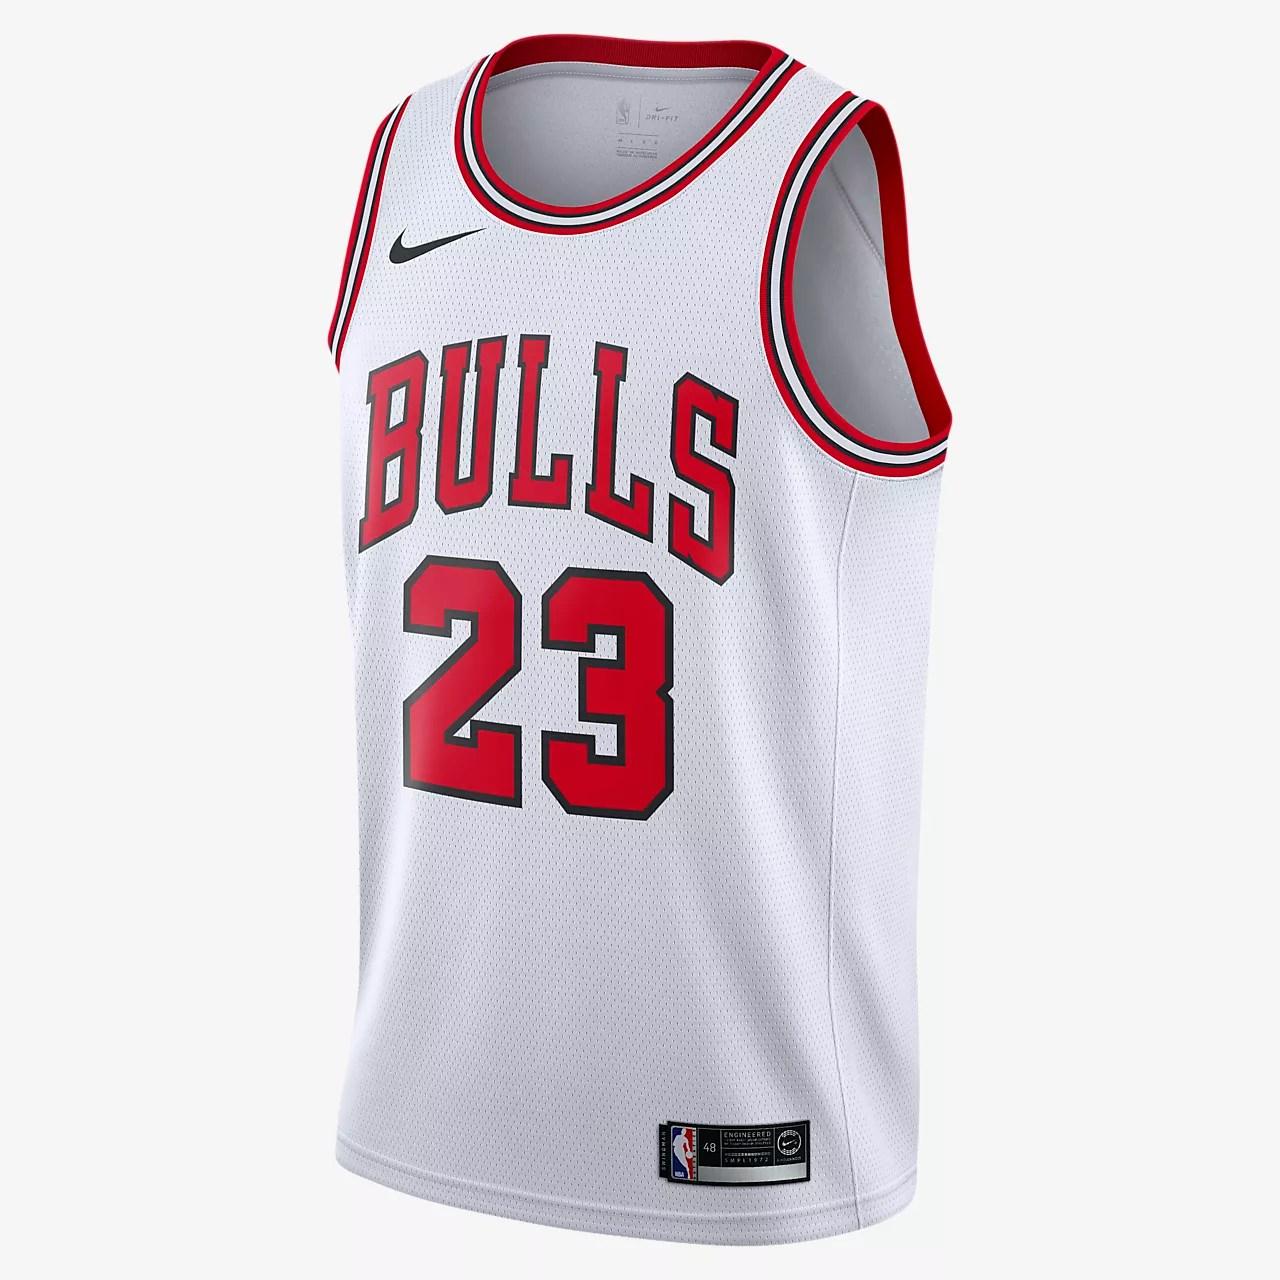 Michael Jordan Bulls Association Edition Nike NBA Swingman 球衣。Nike TW